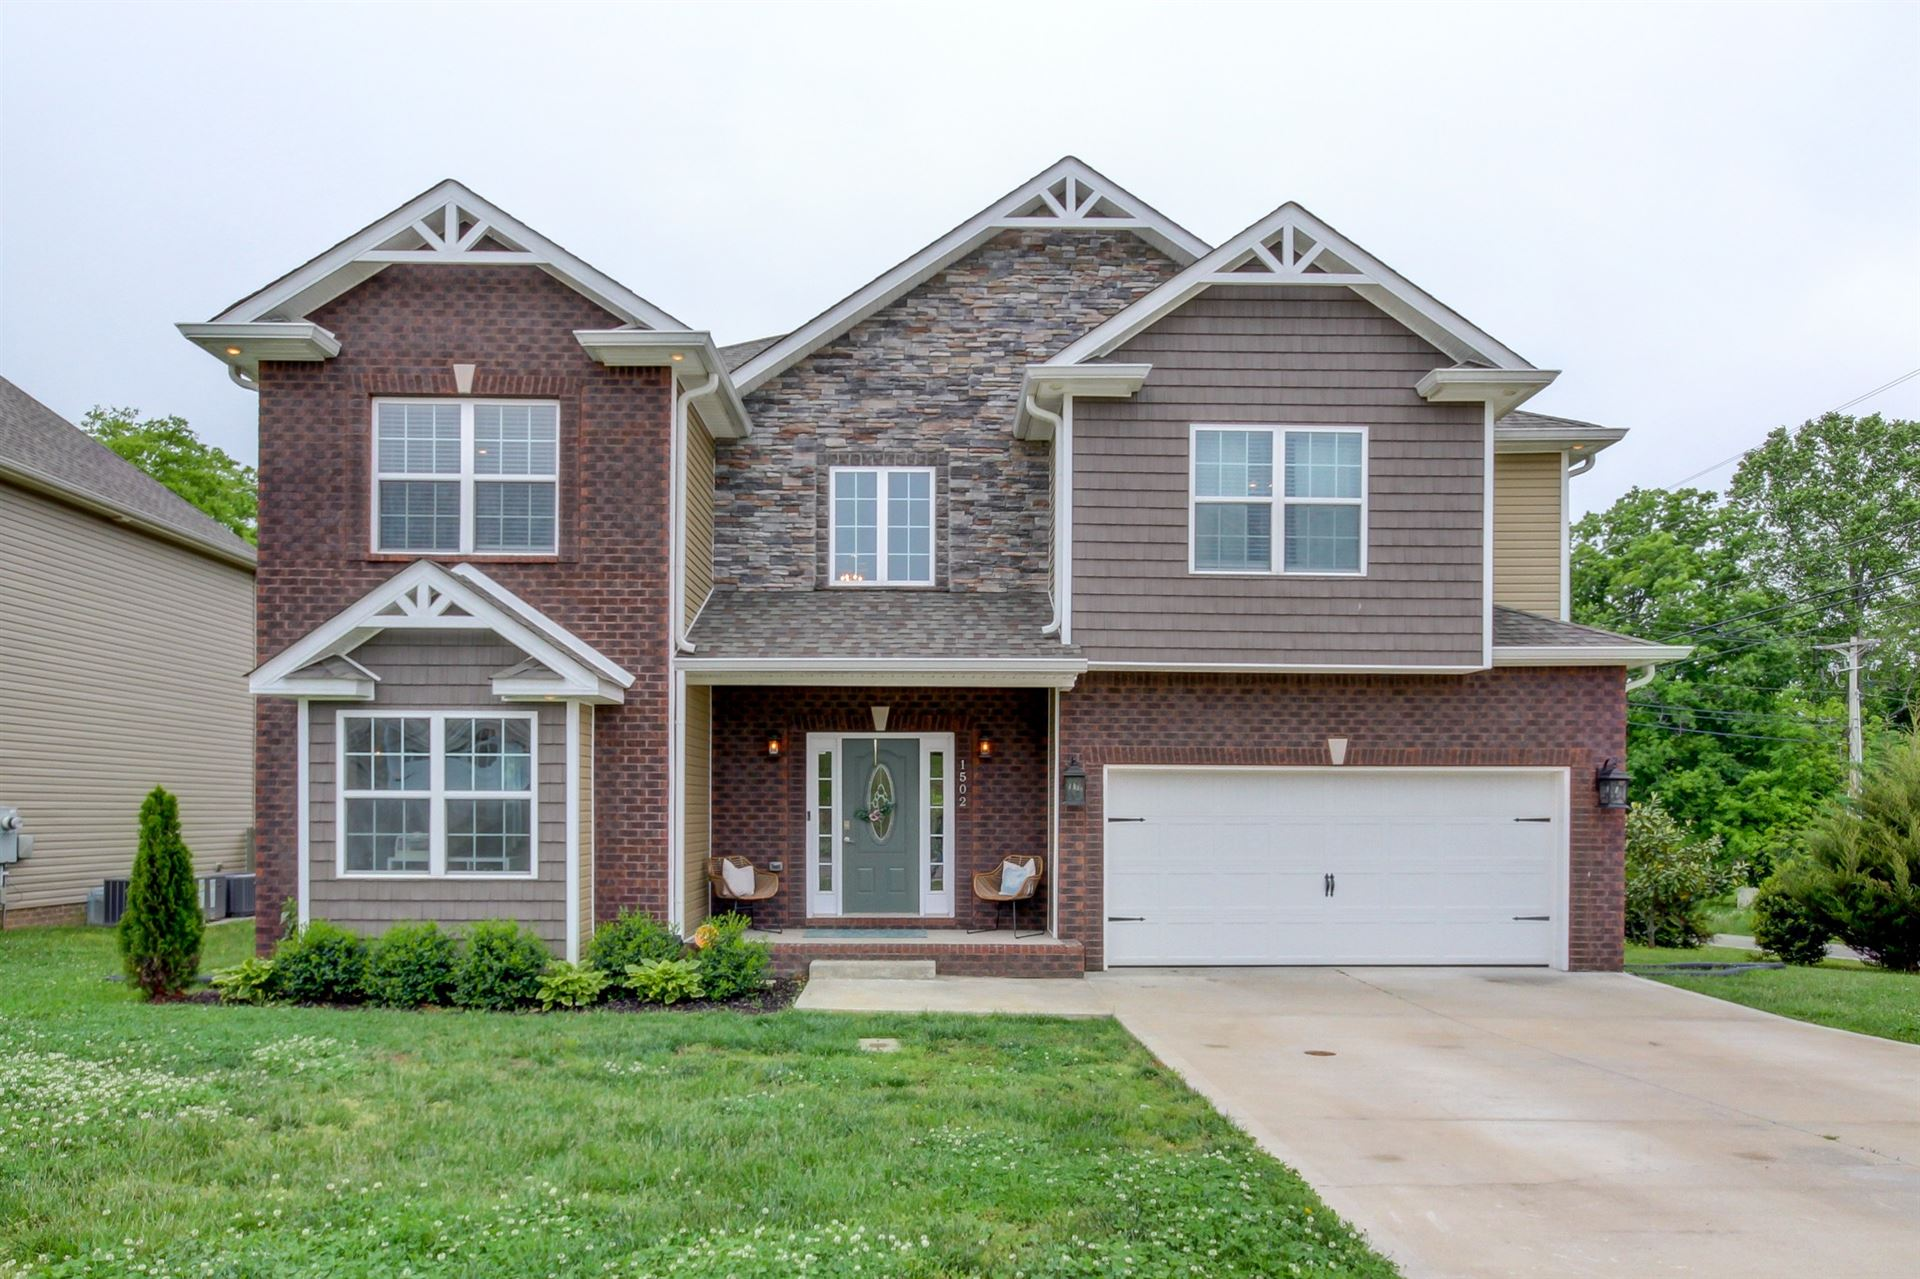 1502 Red Rock Ct, Clarksville, TN 37043 - MLS#: 2253212